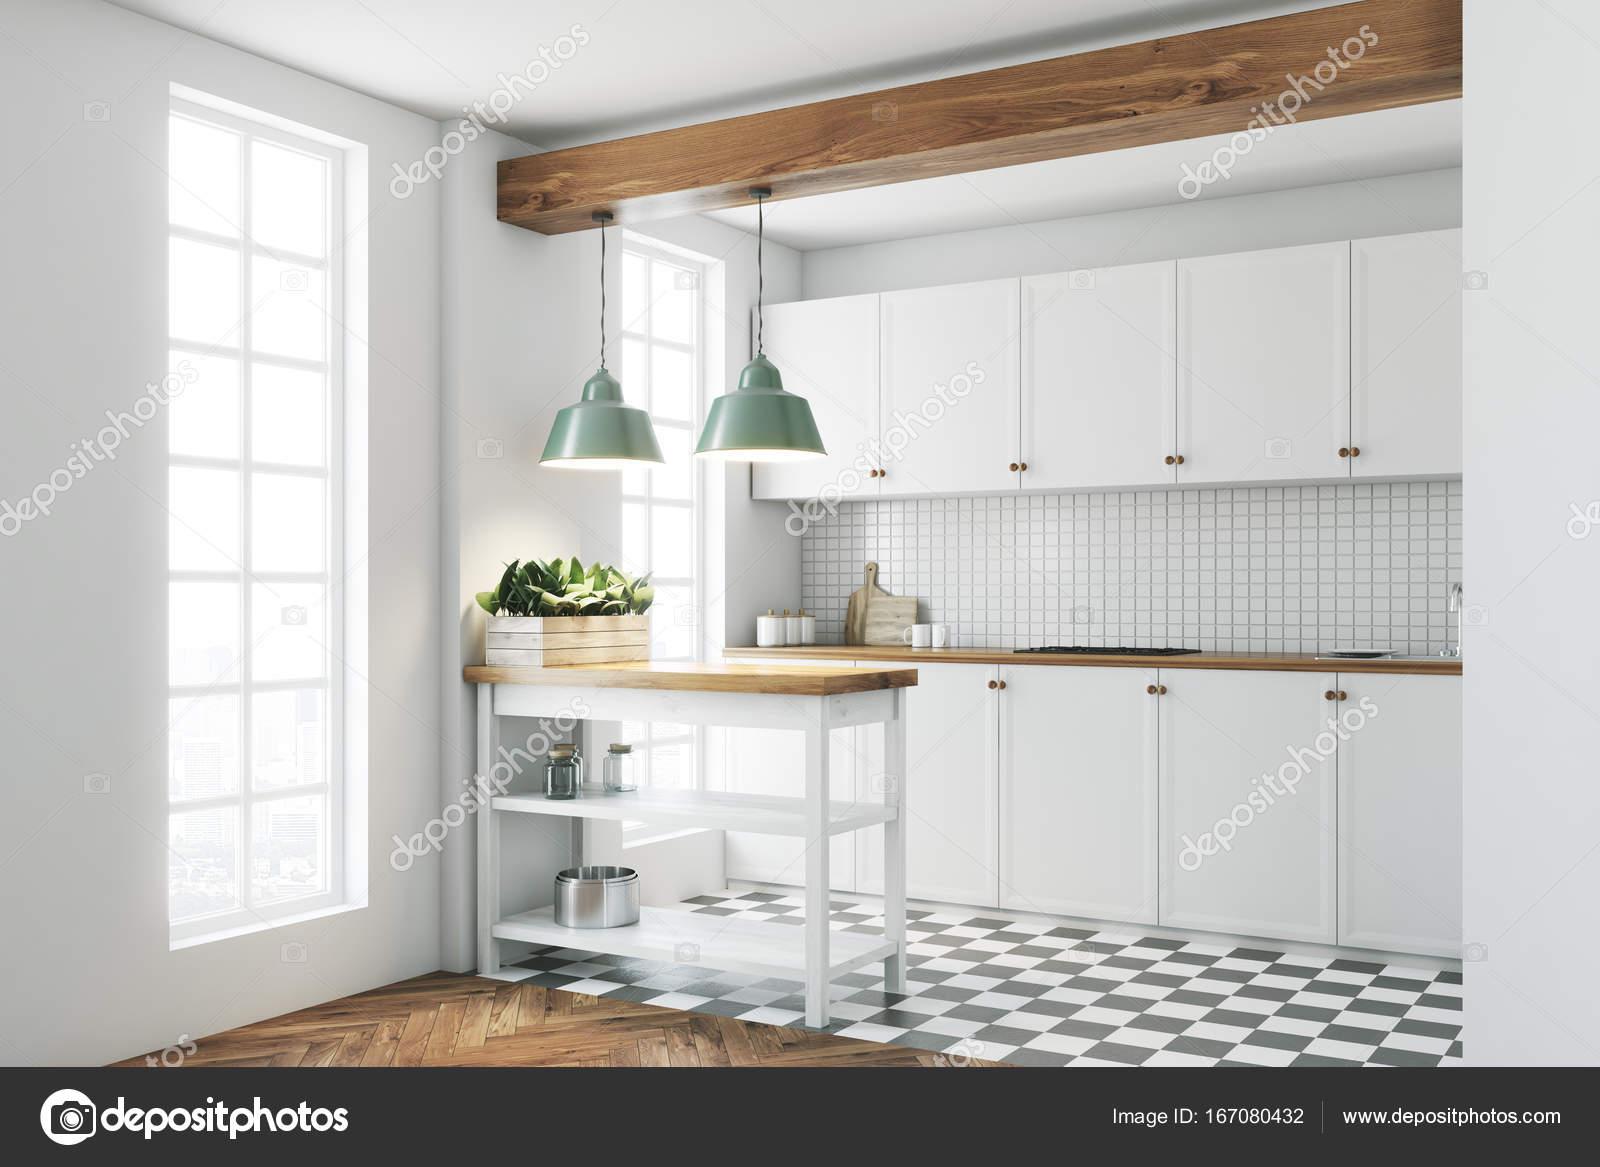 Cucina bianca interni piastrelle piano lato foto stock denisismagilov 167080432 - Piastrelle per cucina bianca ...